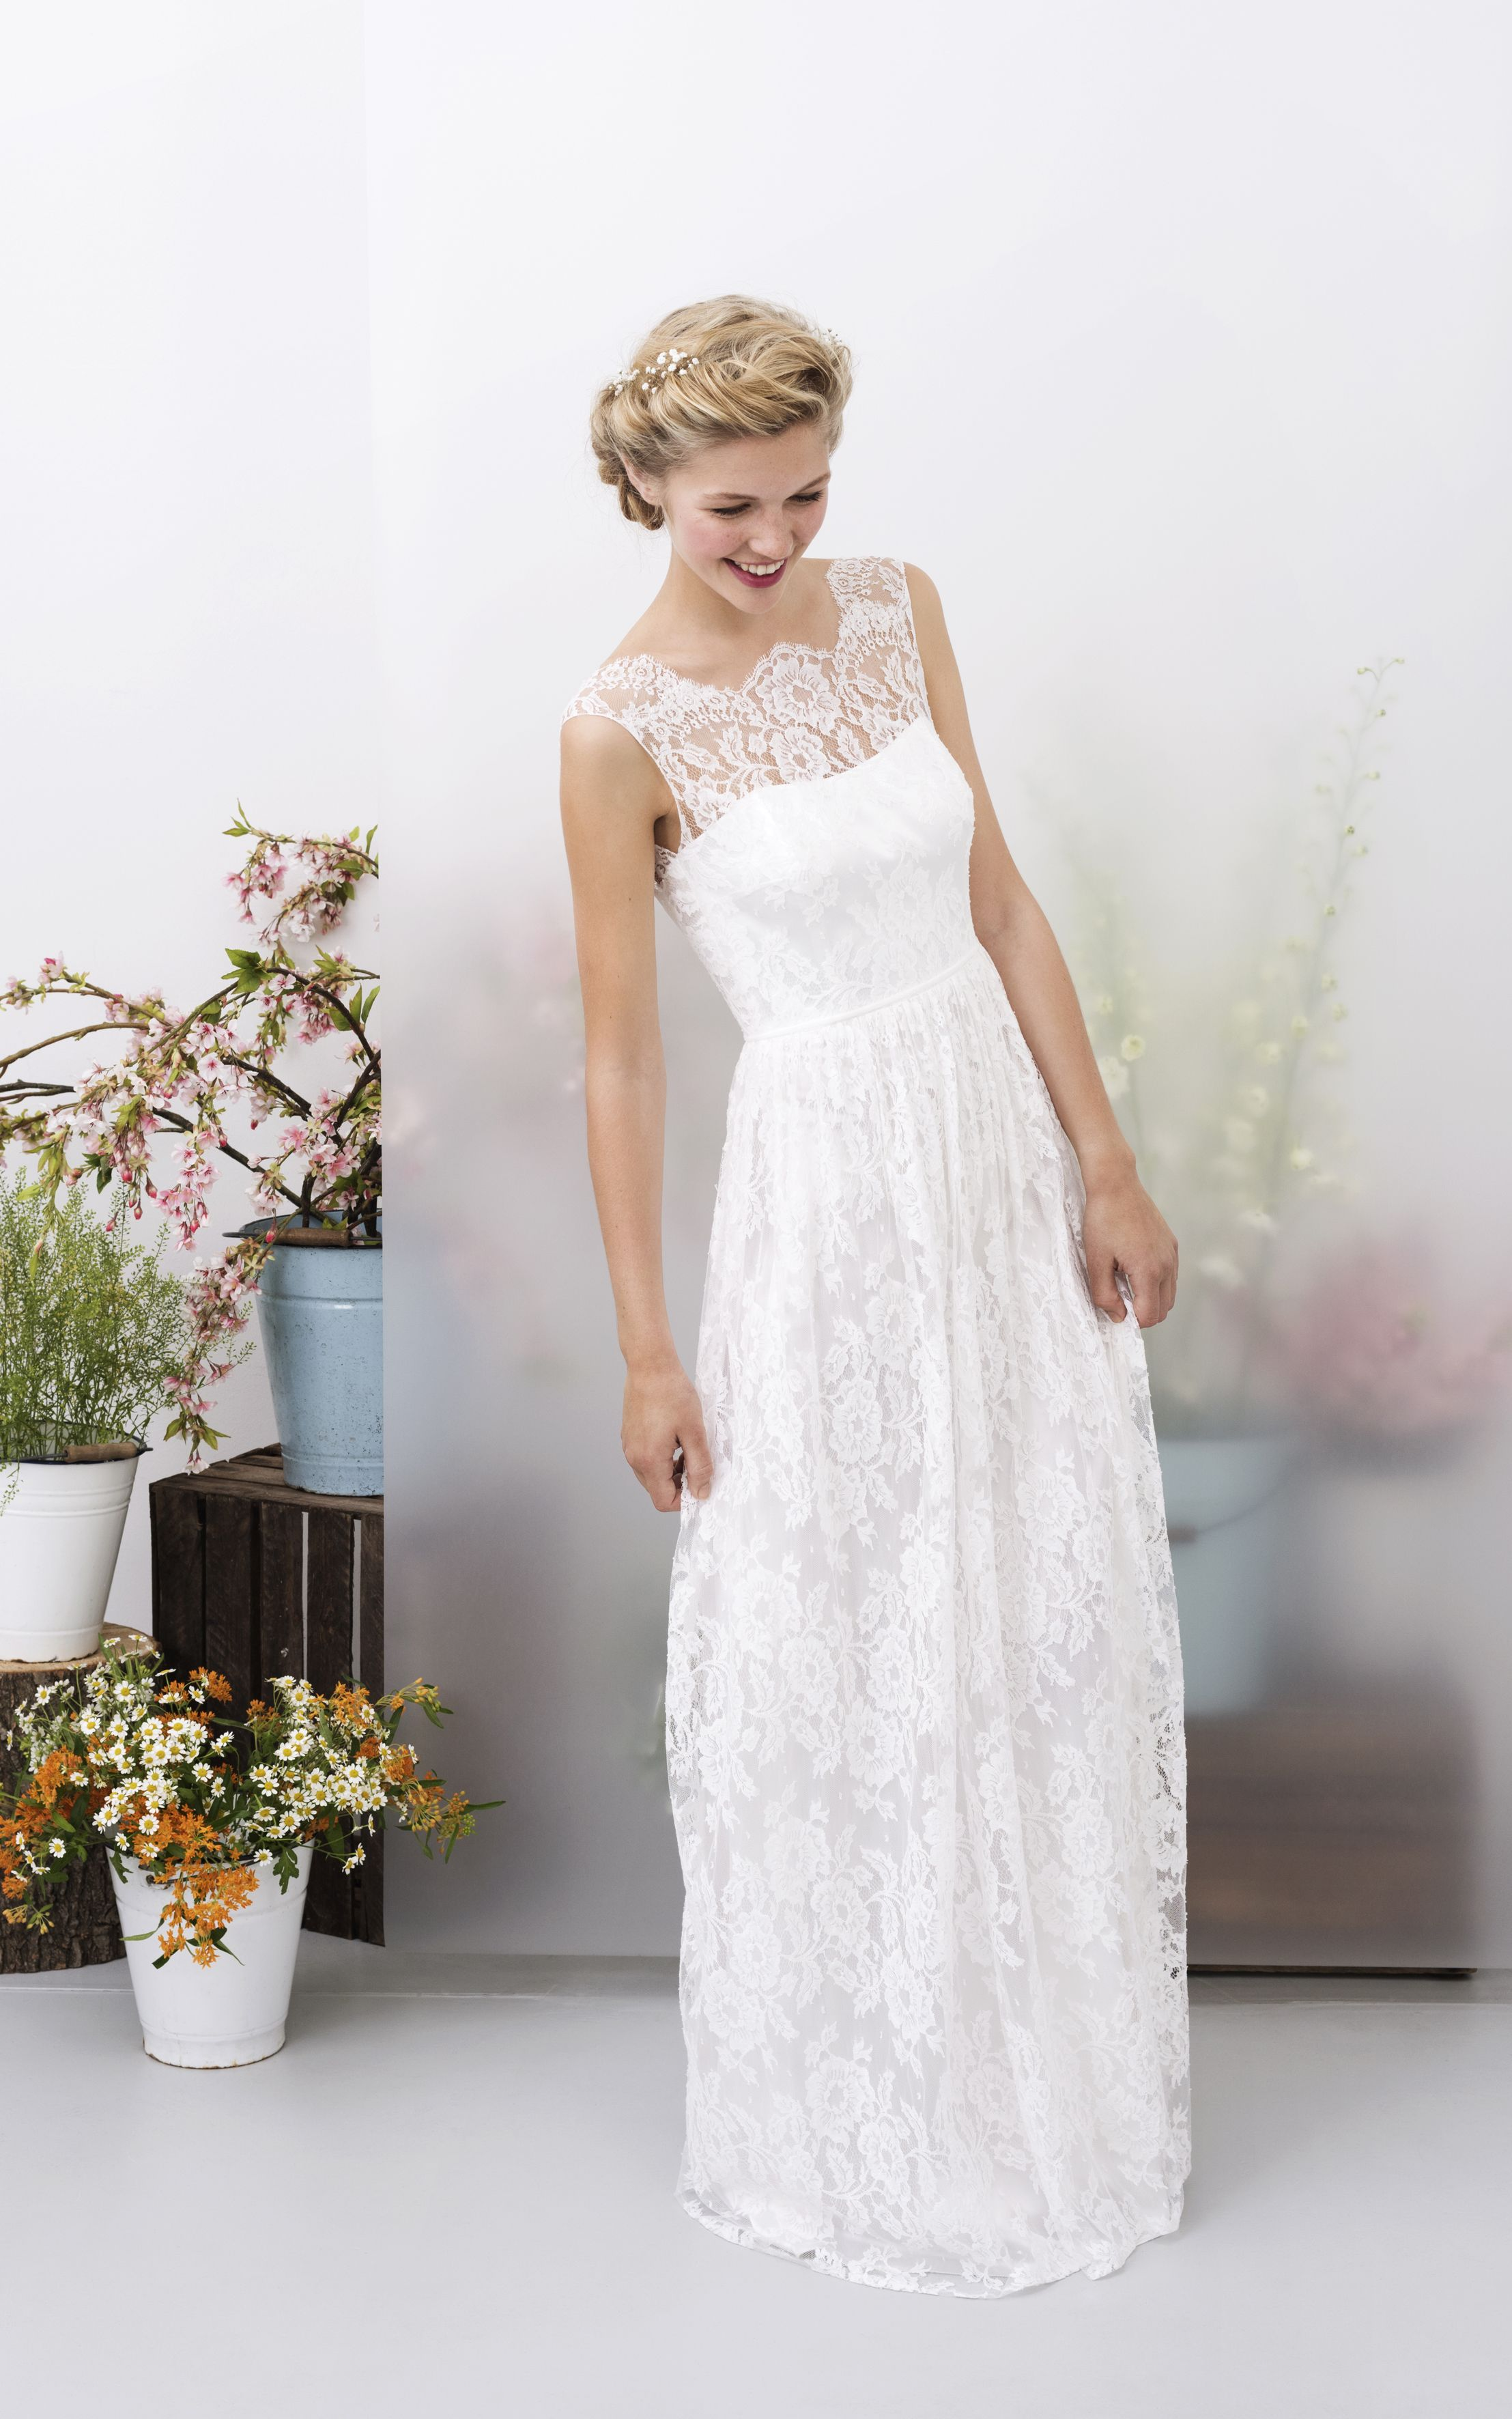 kisui OUI Collection Bridal Style: elsa Brautkleid, Weddingdress by ...